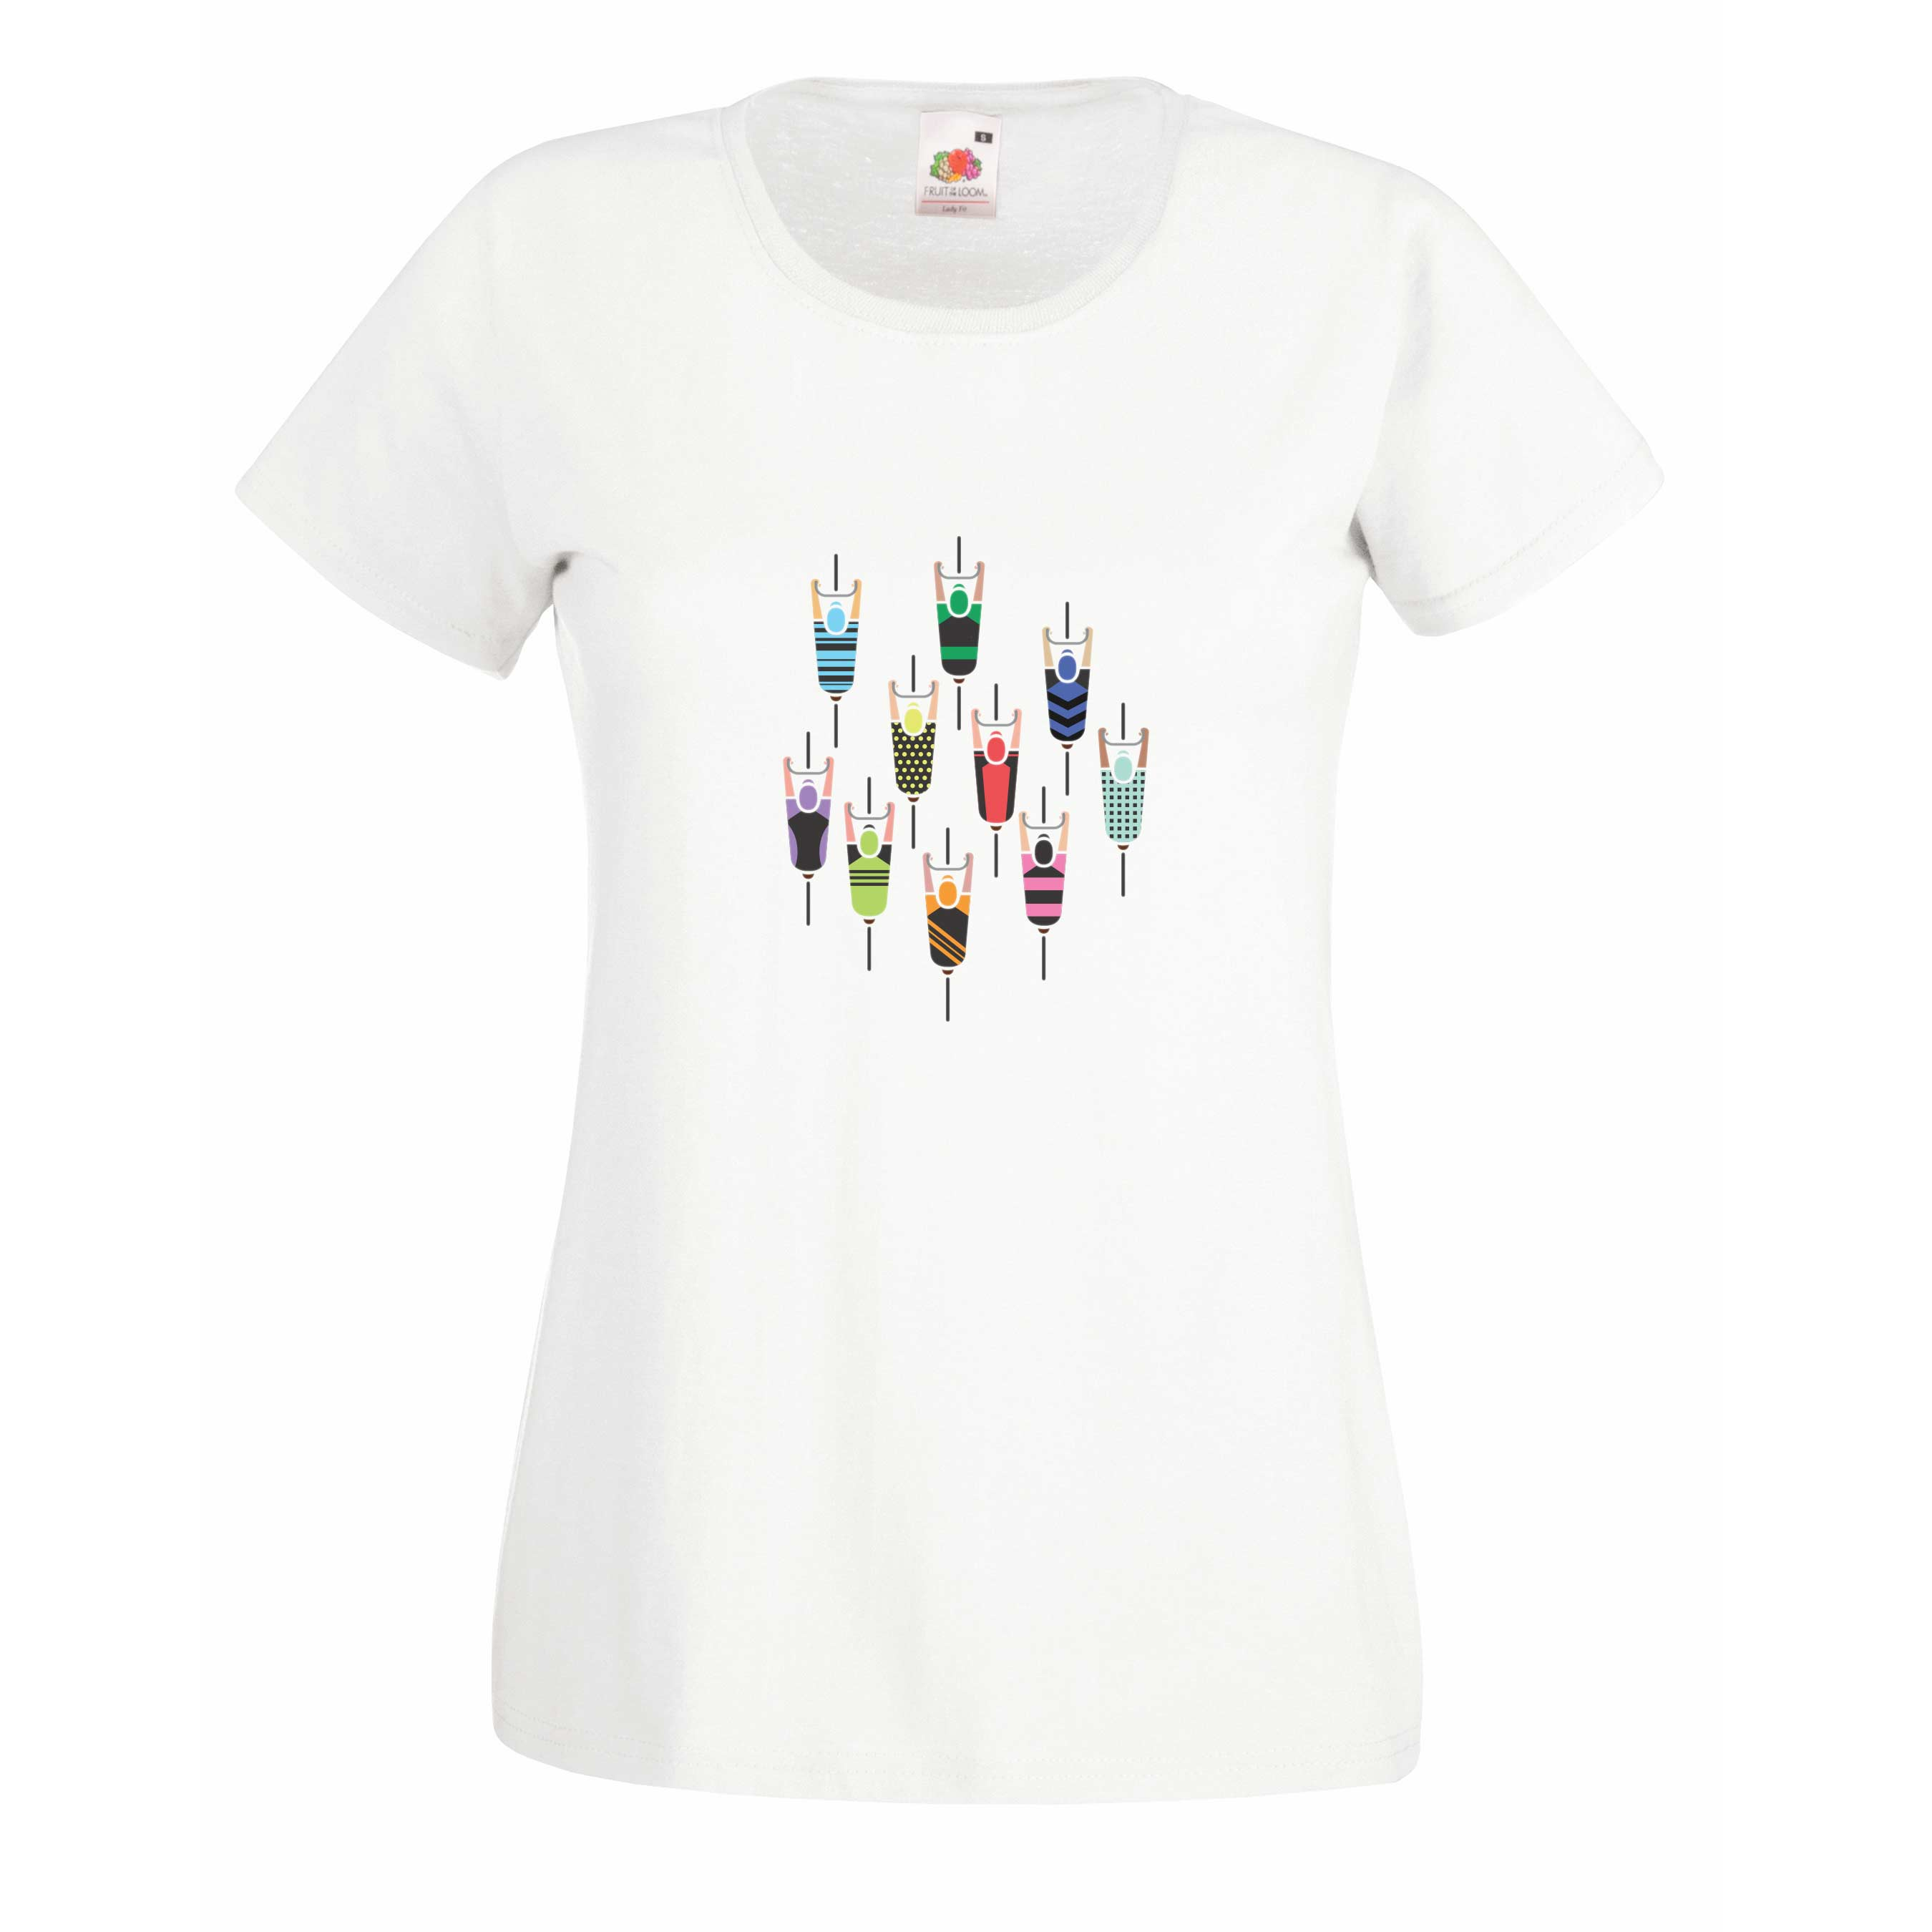 Top view design for t-shirt, hoodie & sweatshirt